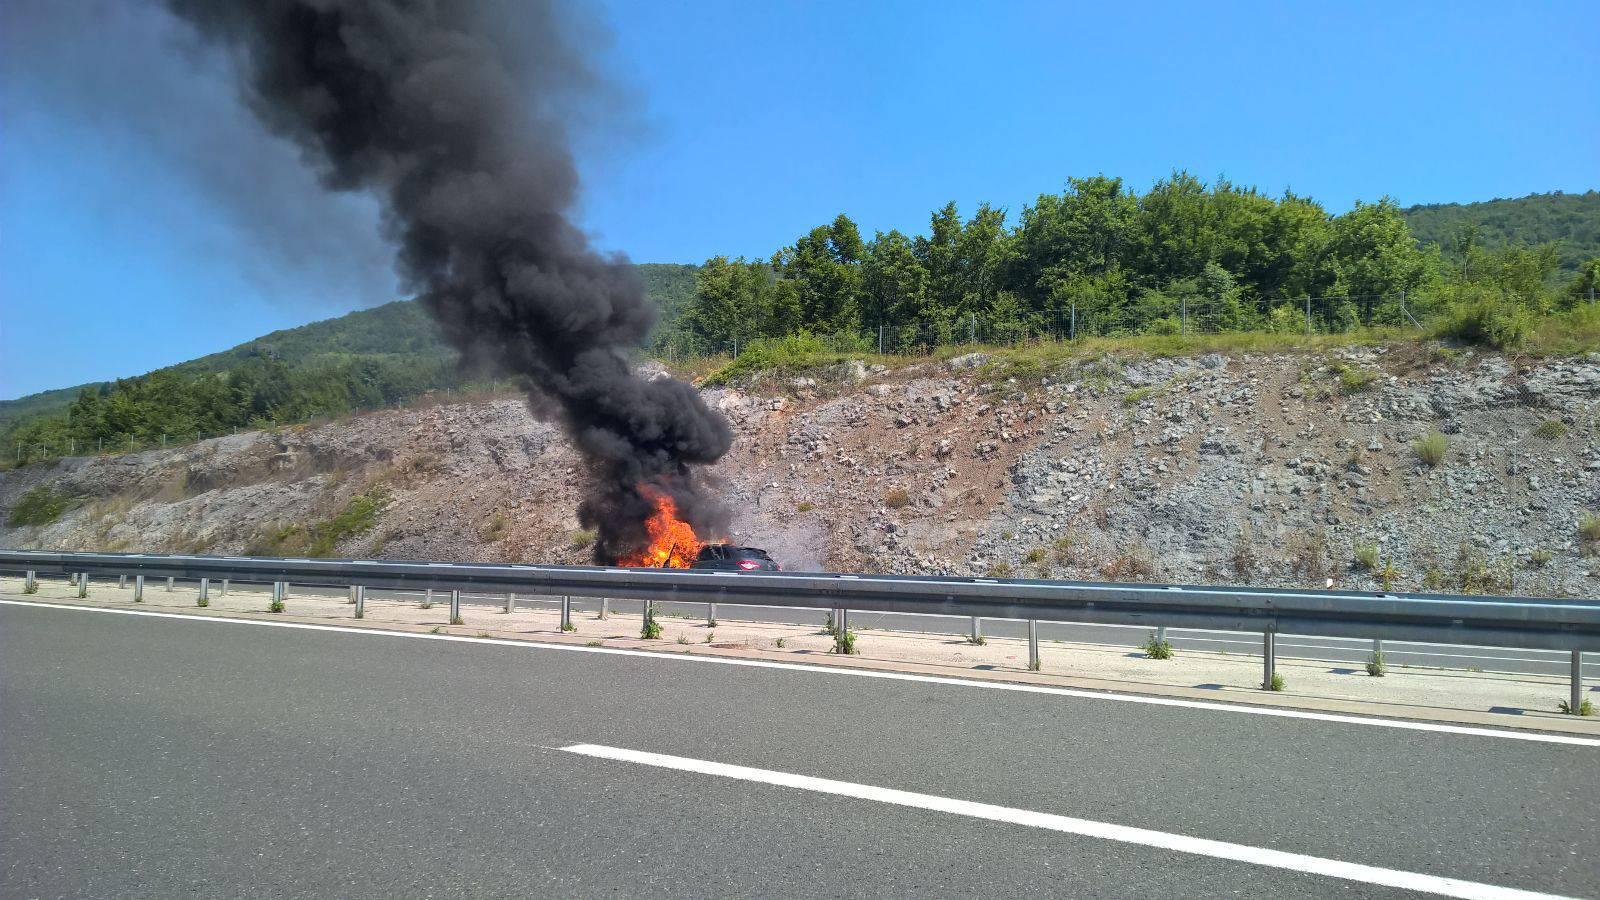 Planuo auto na autocesti A1: Citroen C4 je potpuno izgorio